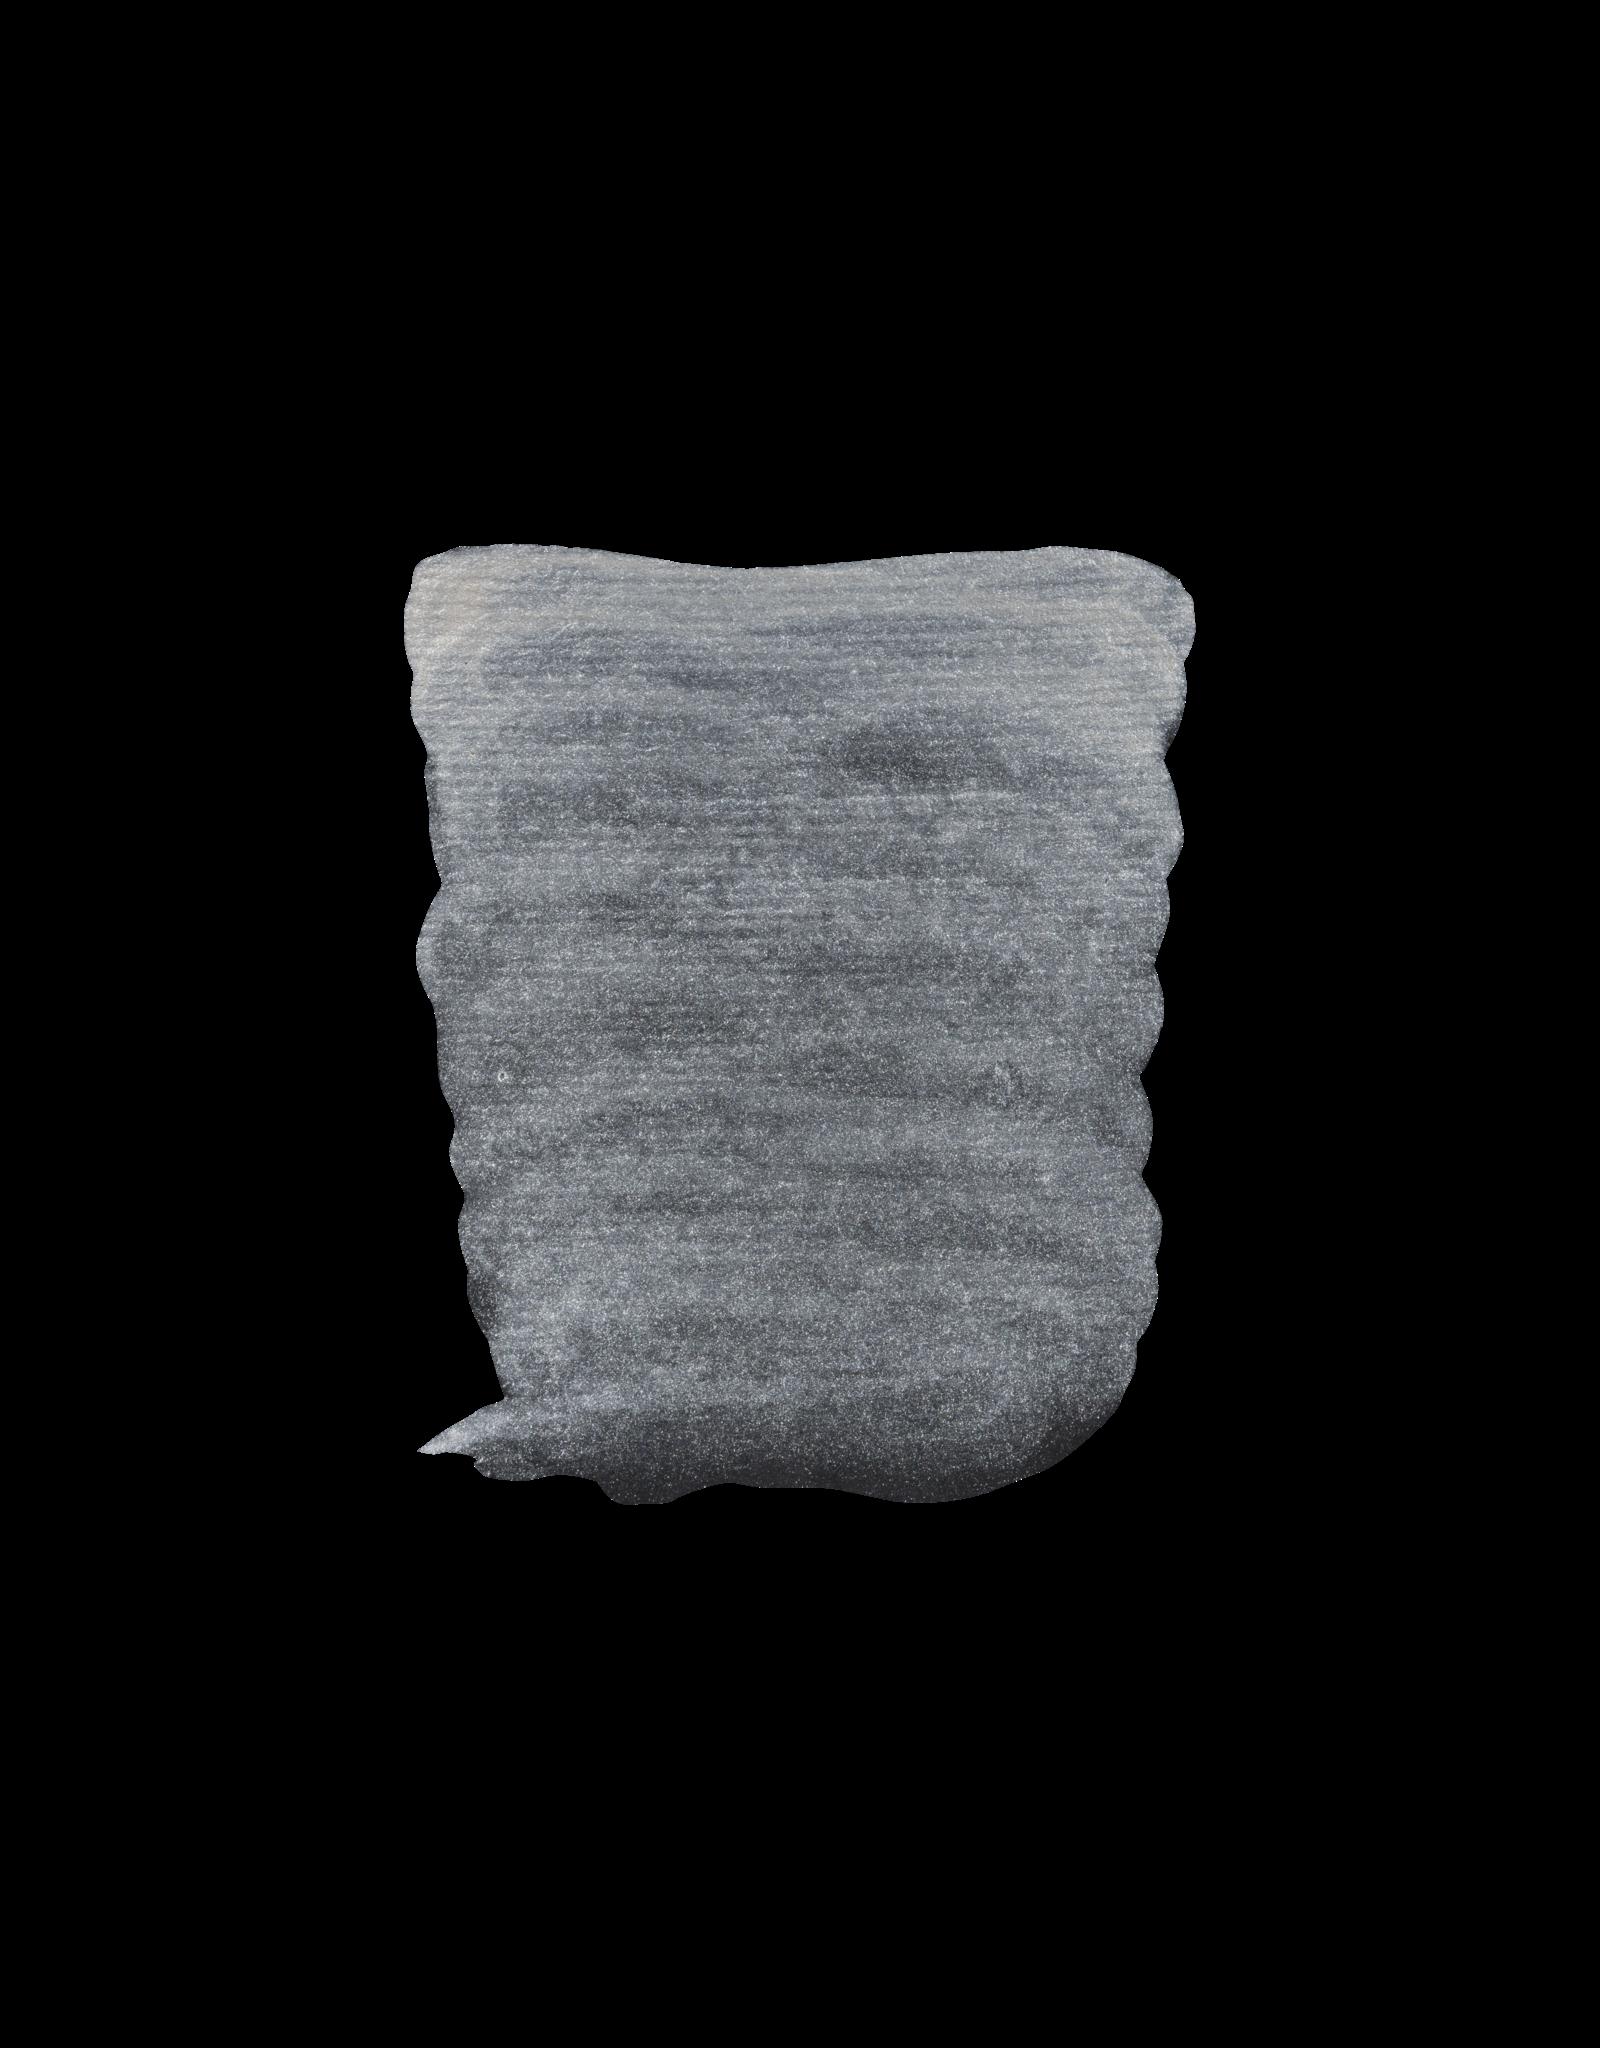 aquarel 1/2 interference wit